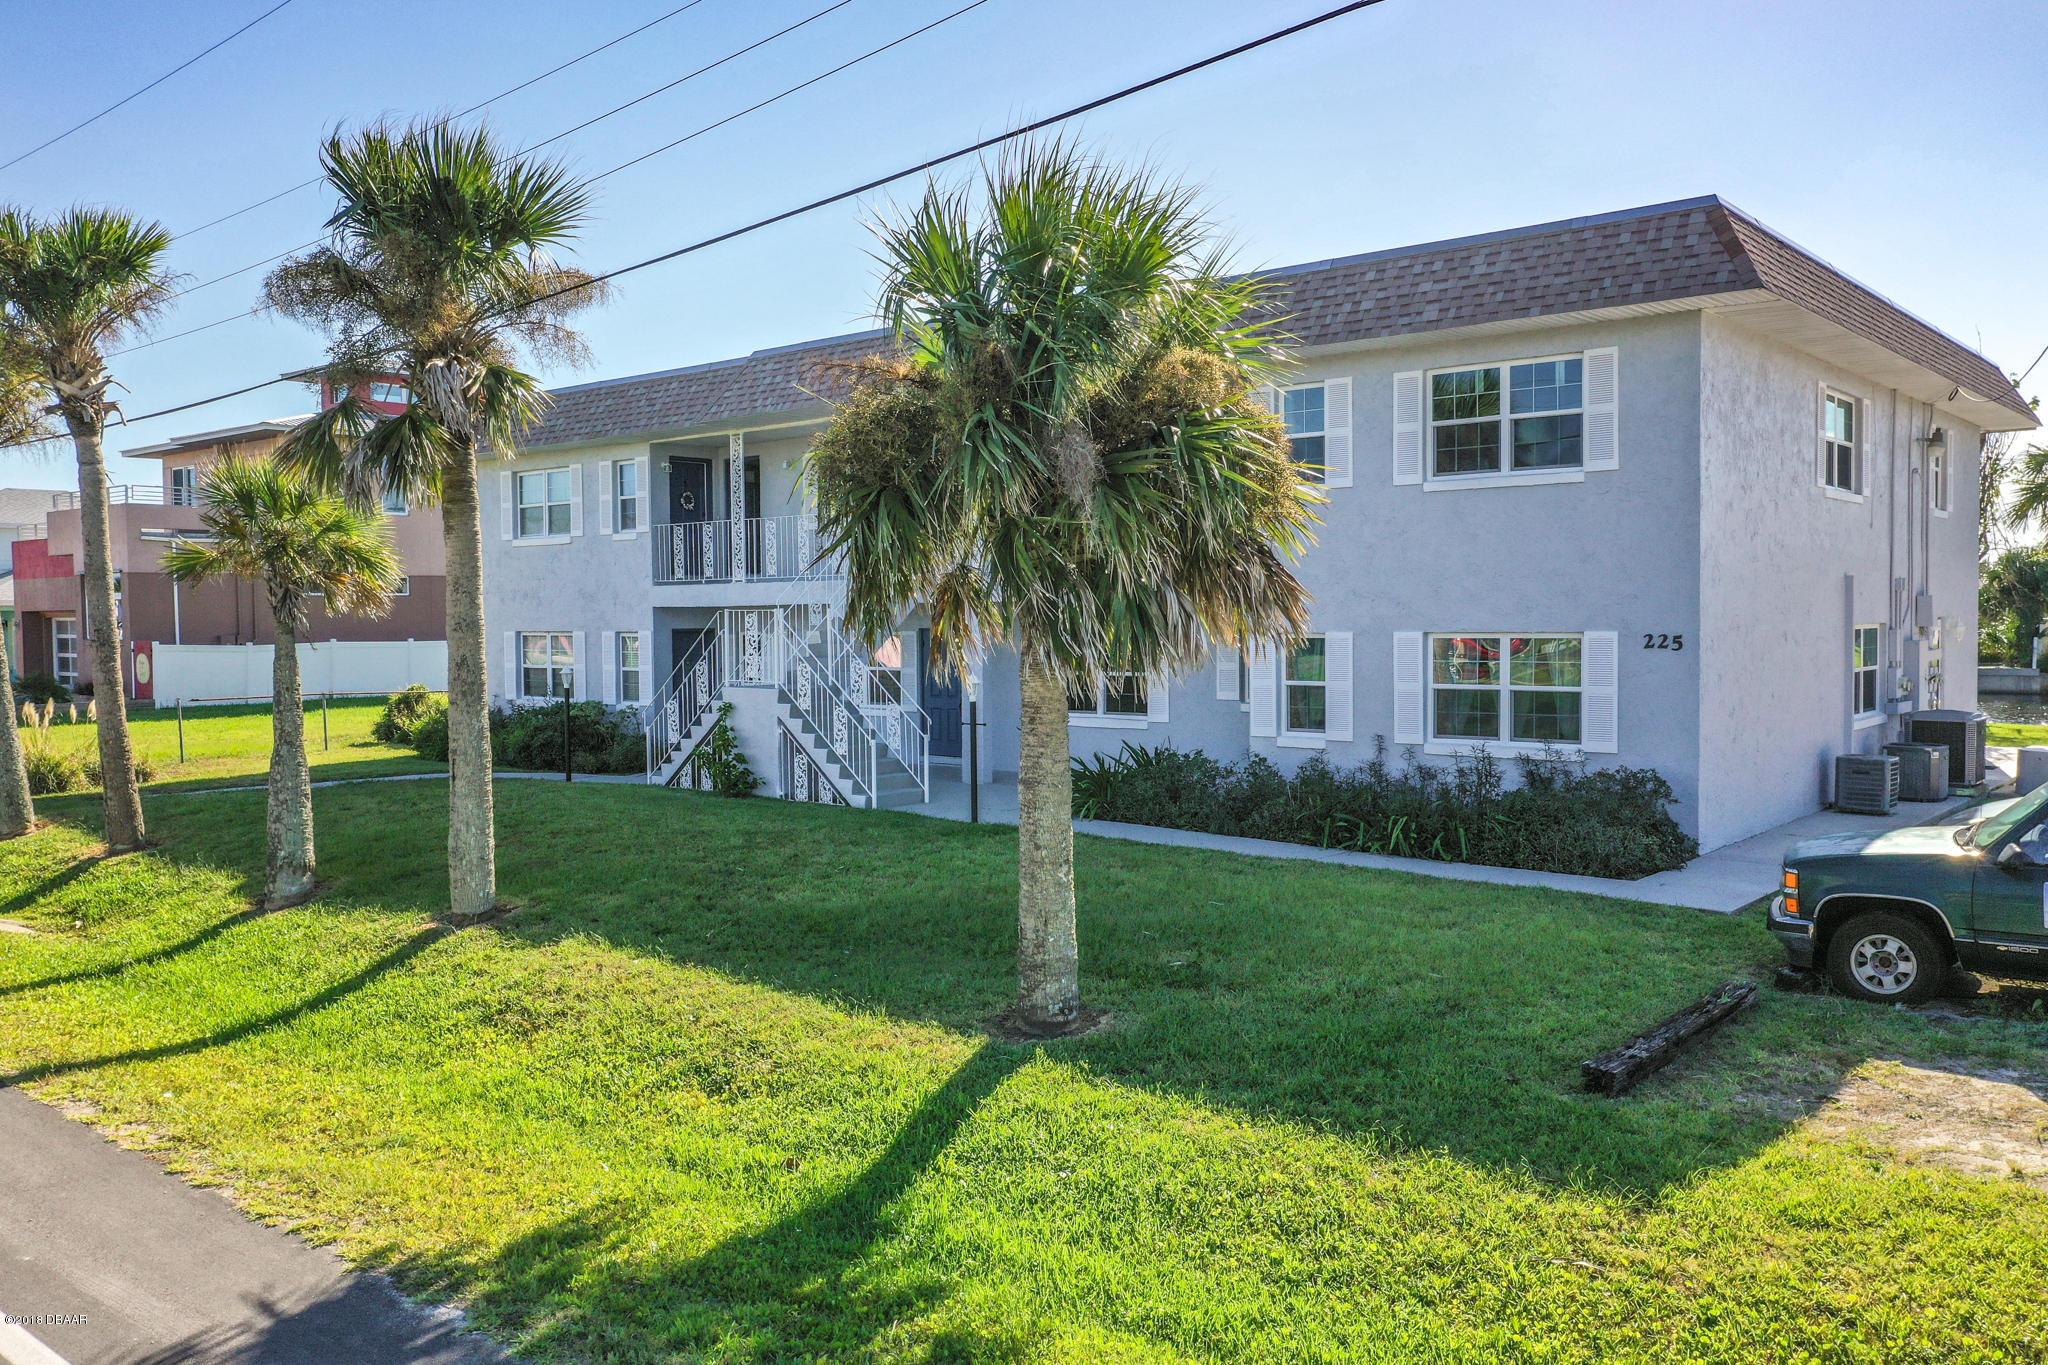 225 N Flagler Avenue Flagler Beach, FL 32136